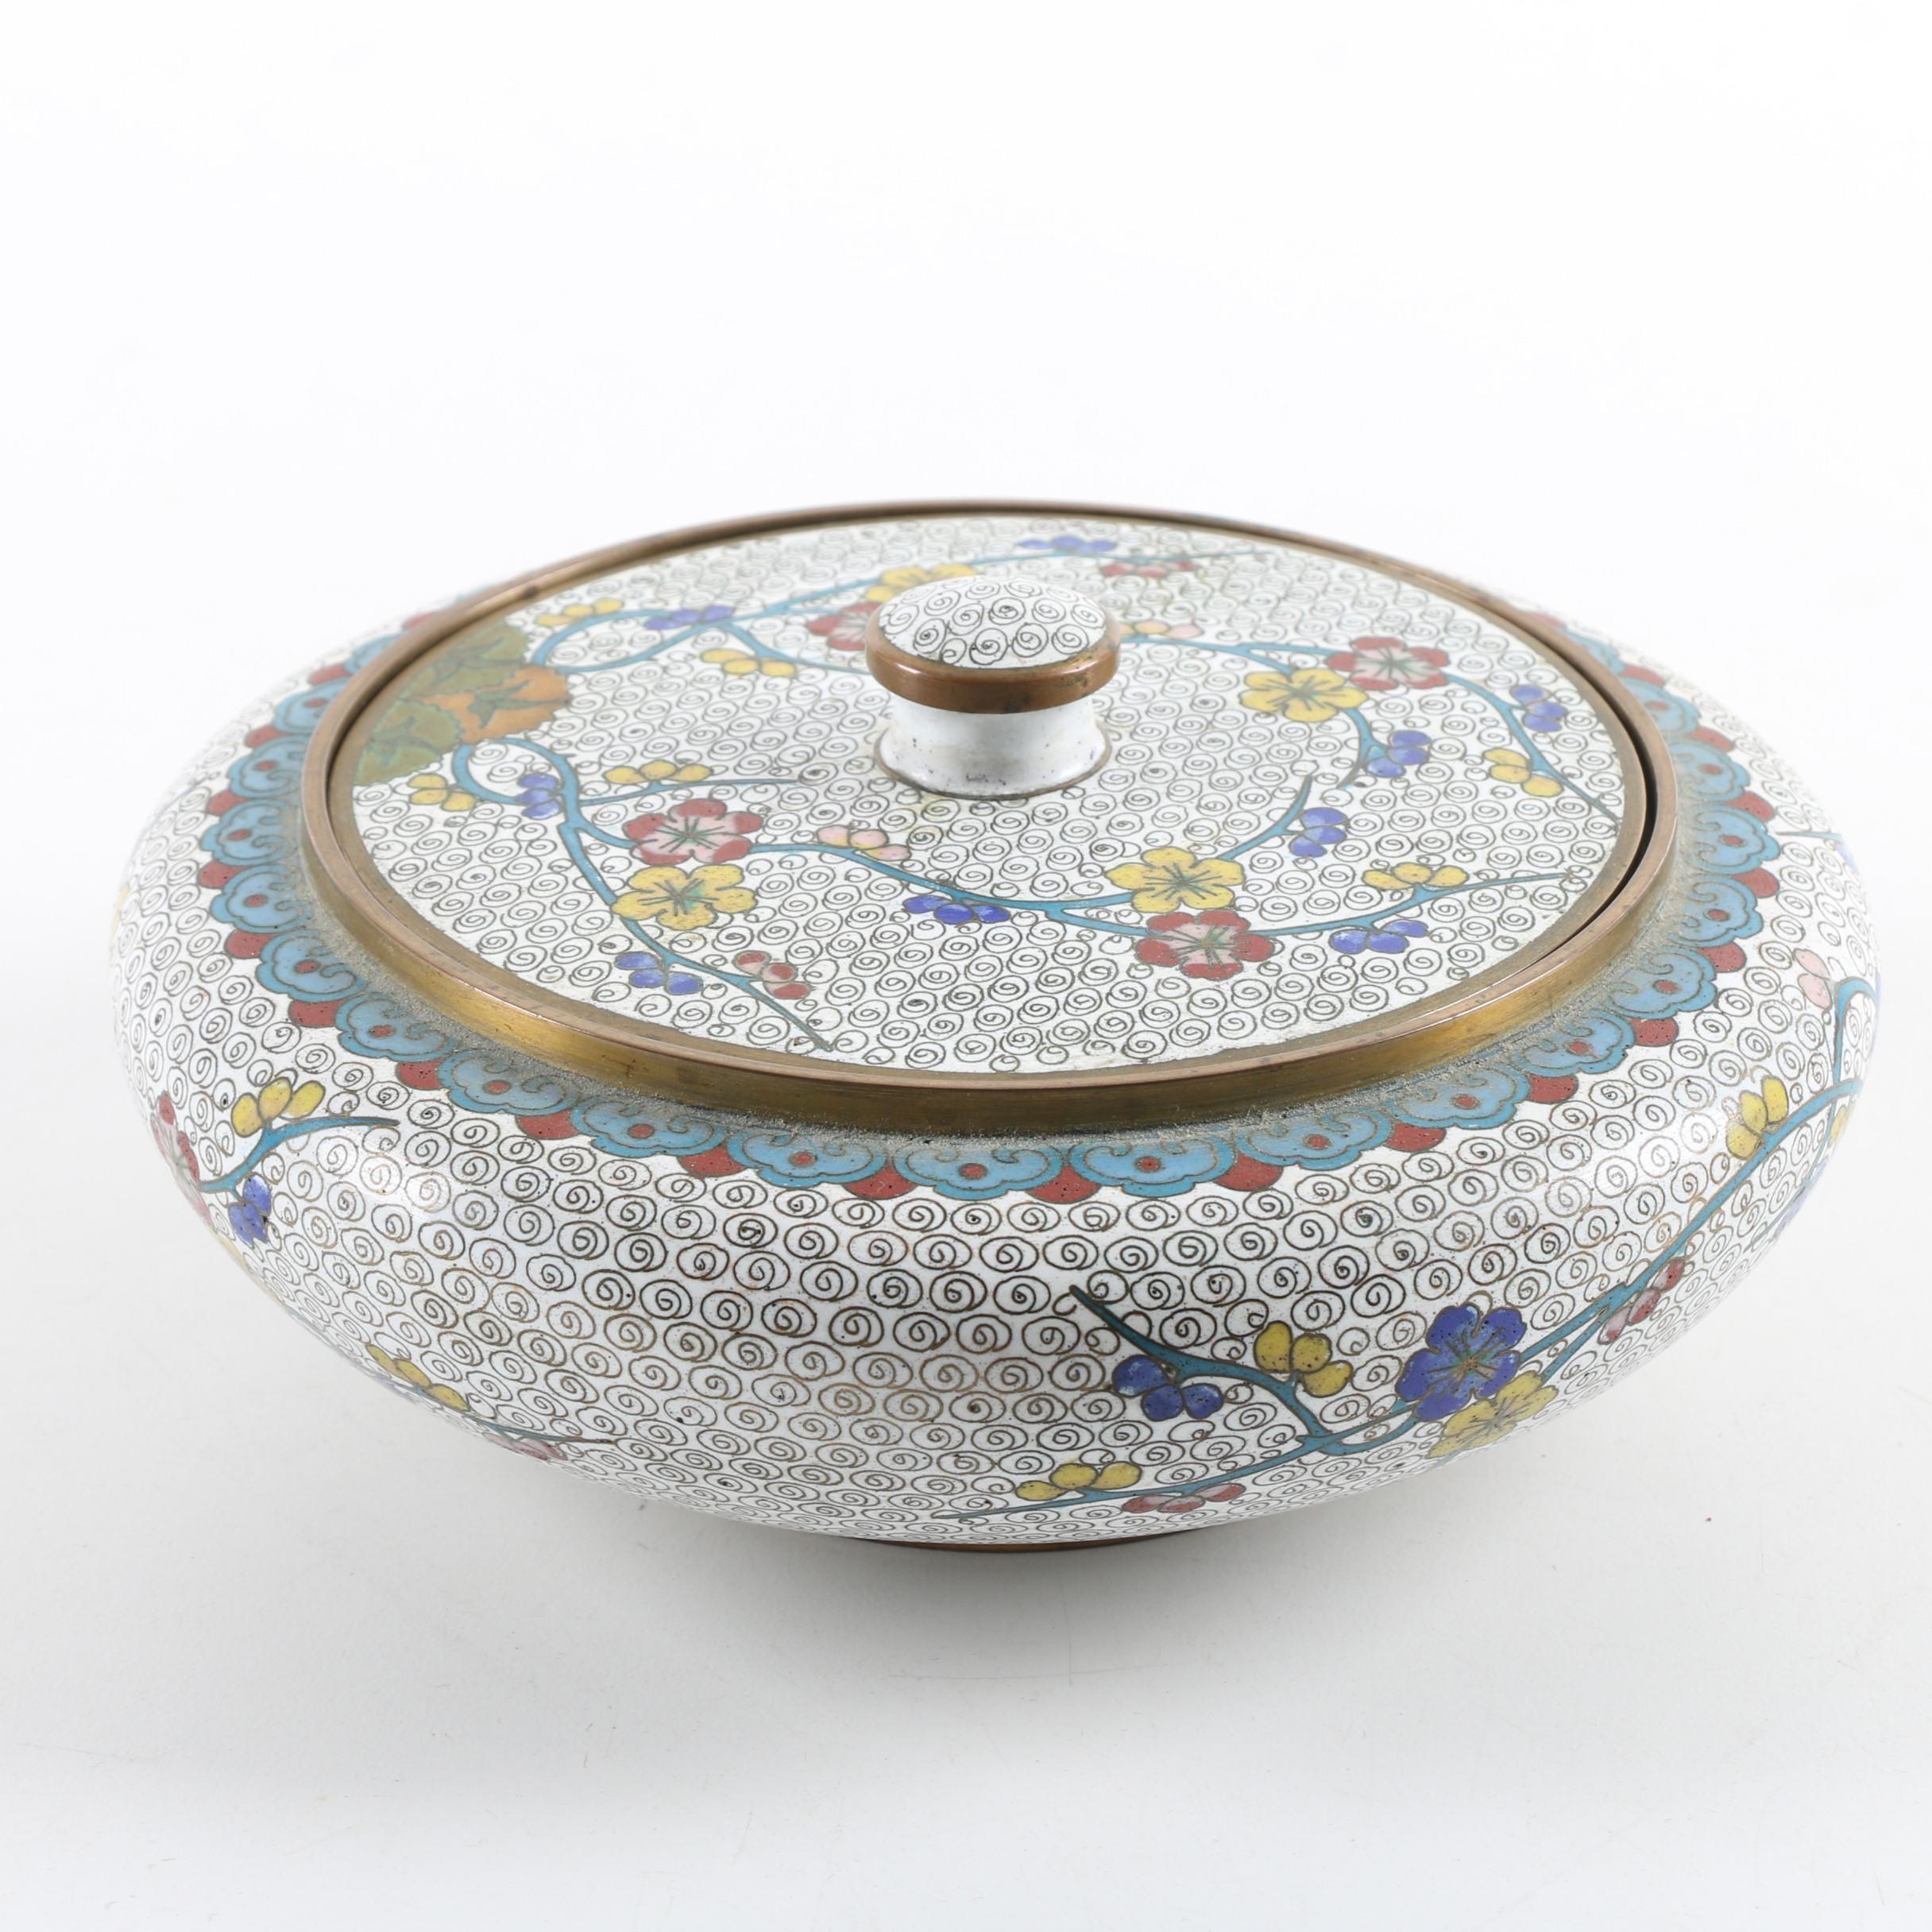 Chinese Cloisonné Jar